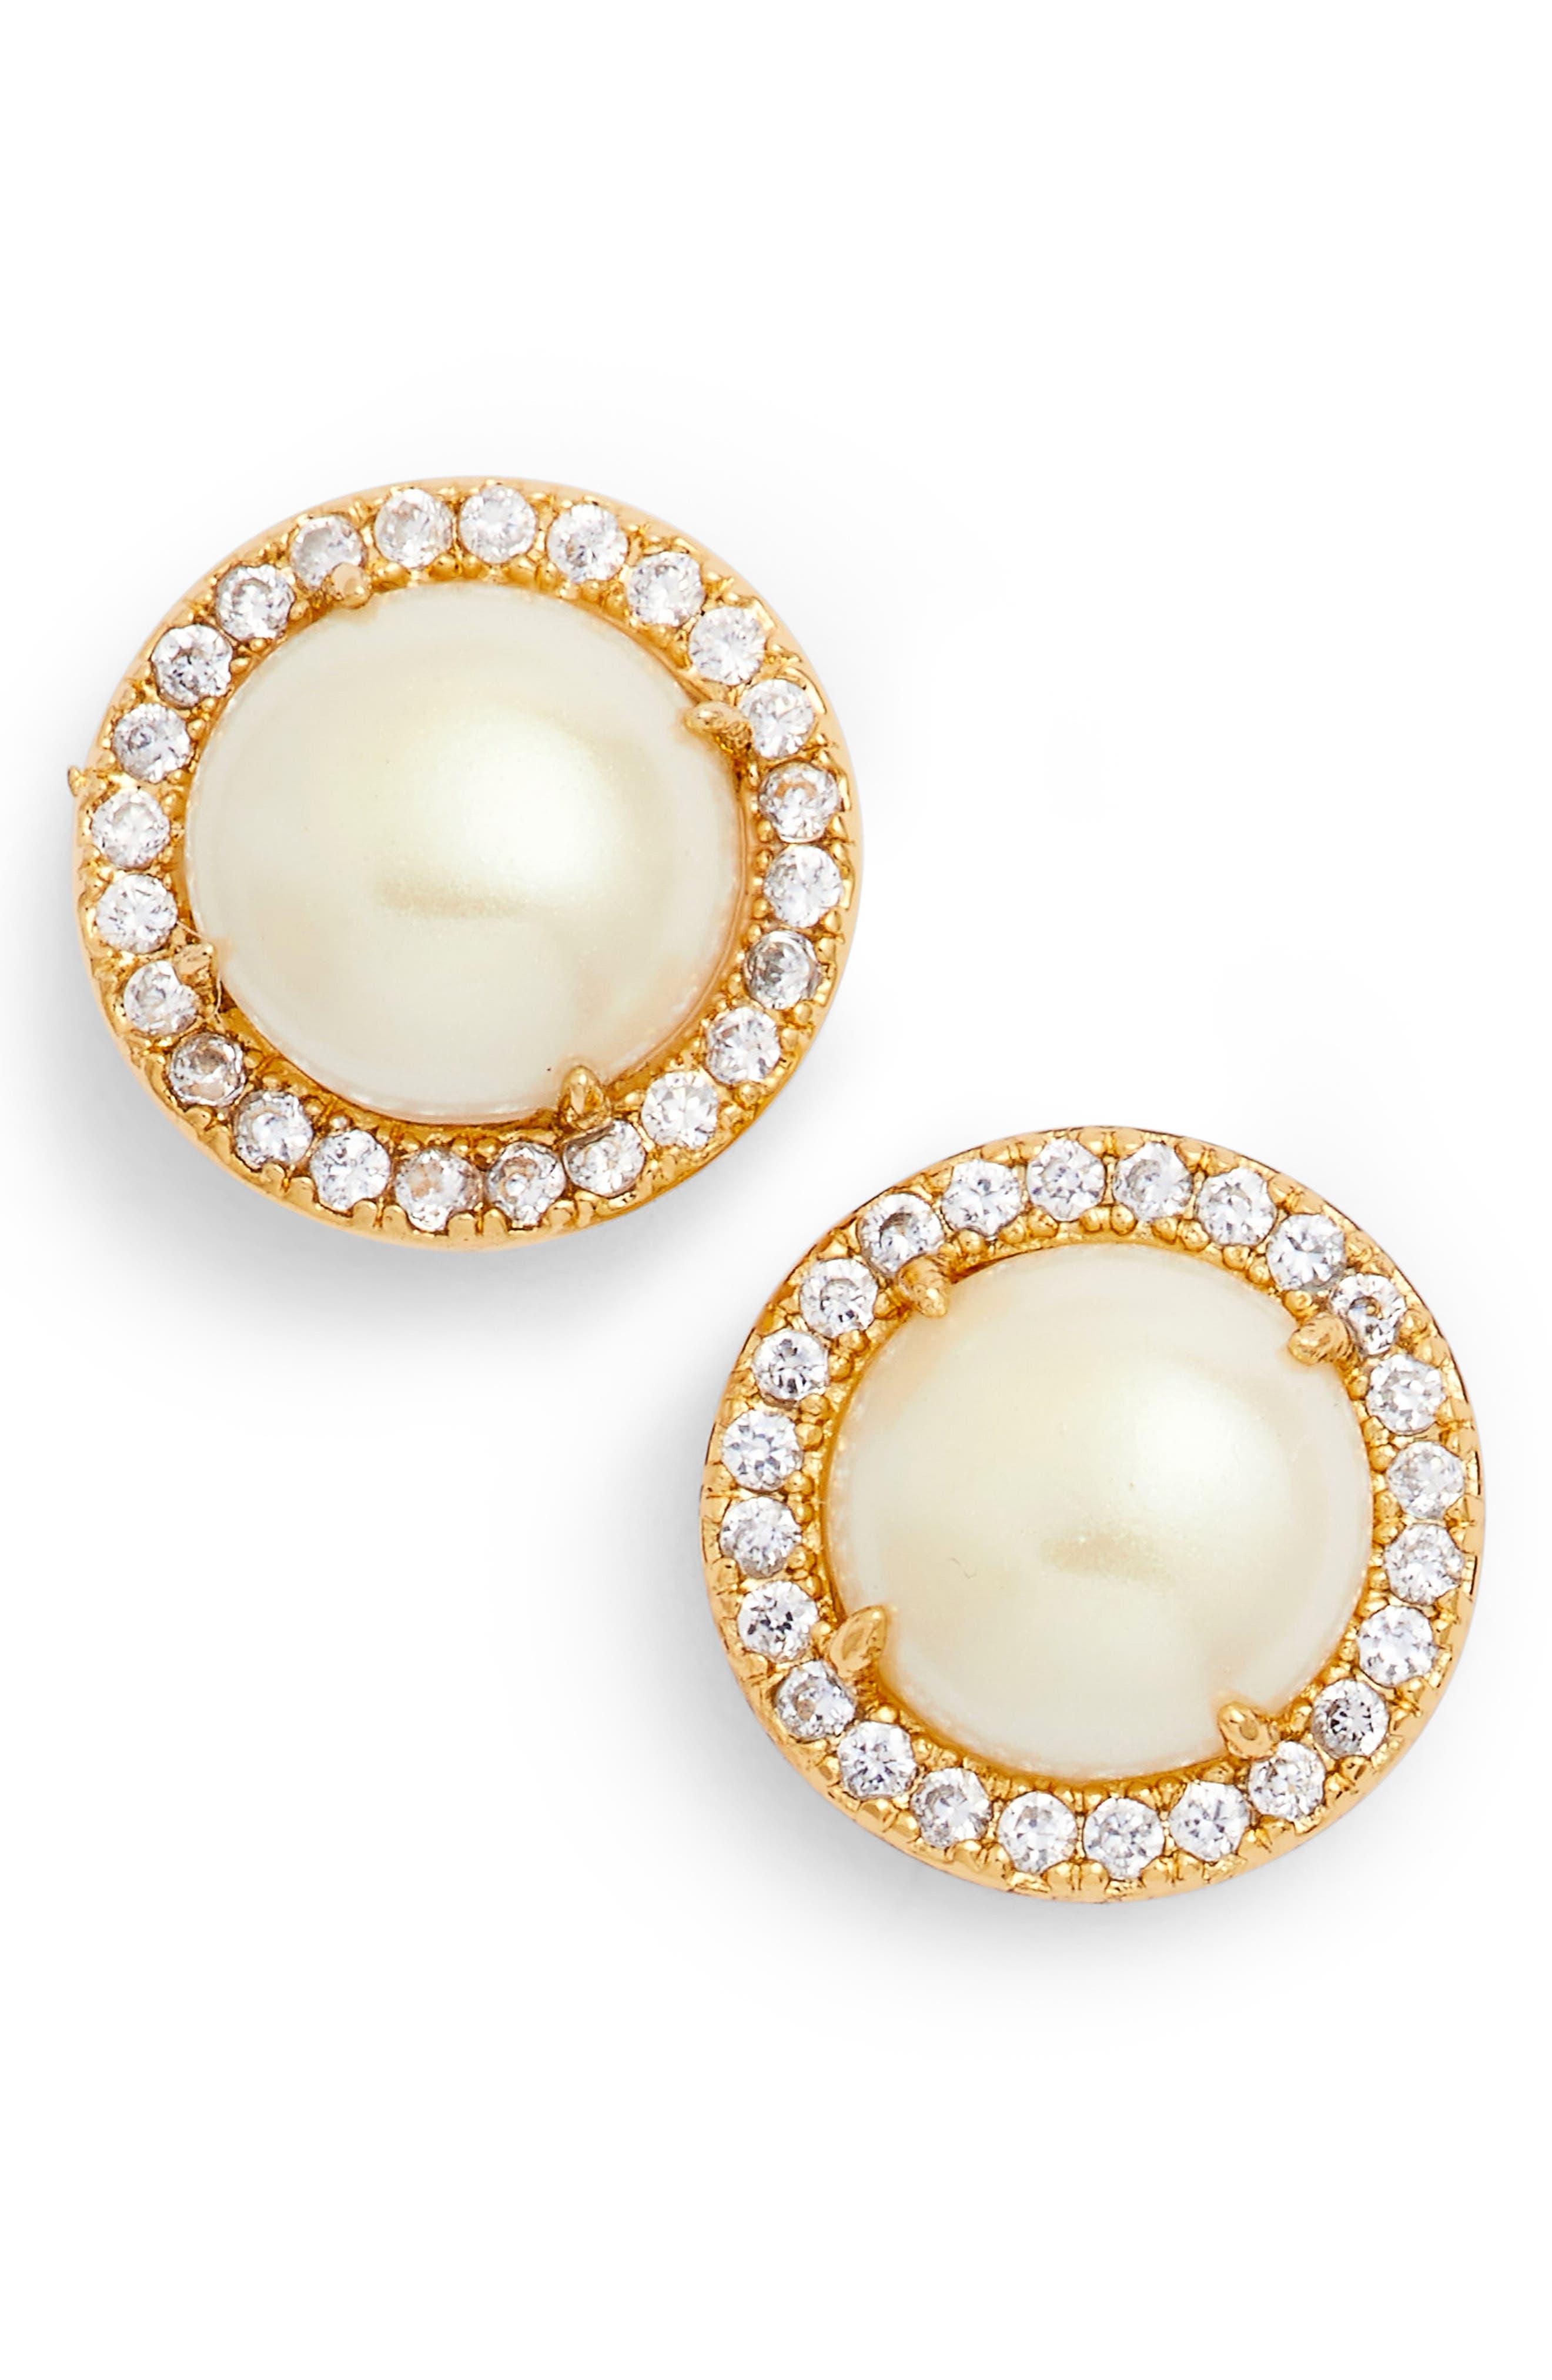 bright ideas pavé halo stud earrings,                             Main thumbnail 1, color,                             CREAM/ GOLD